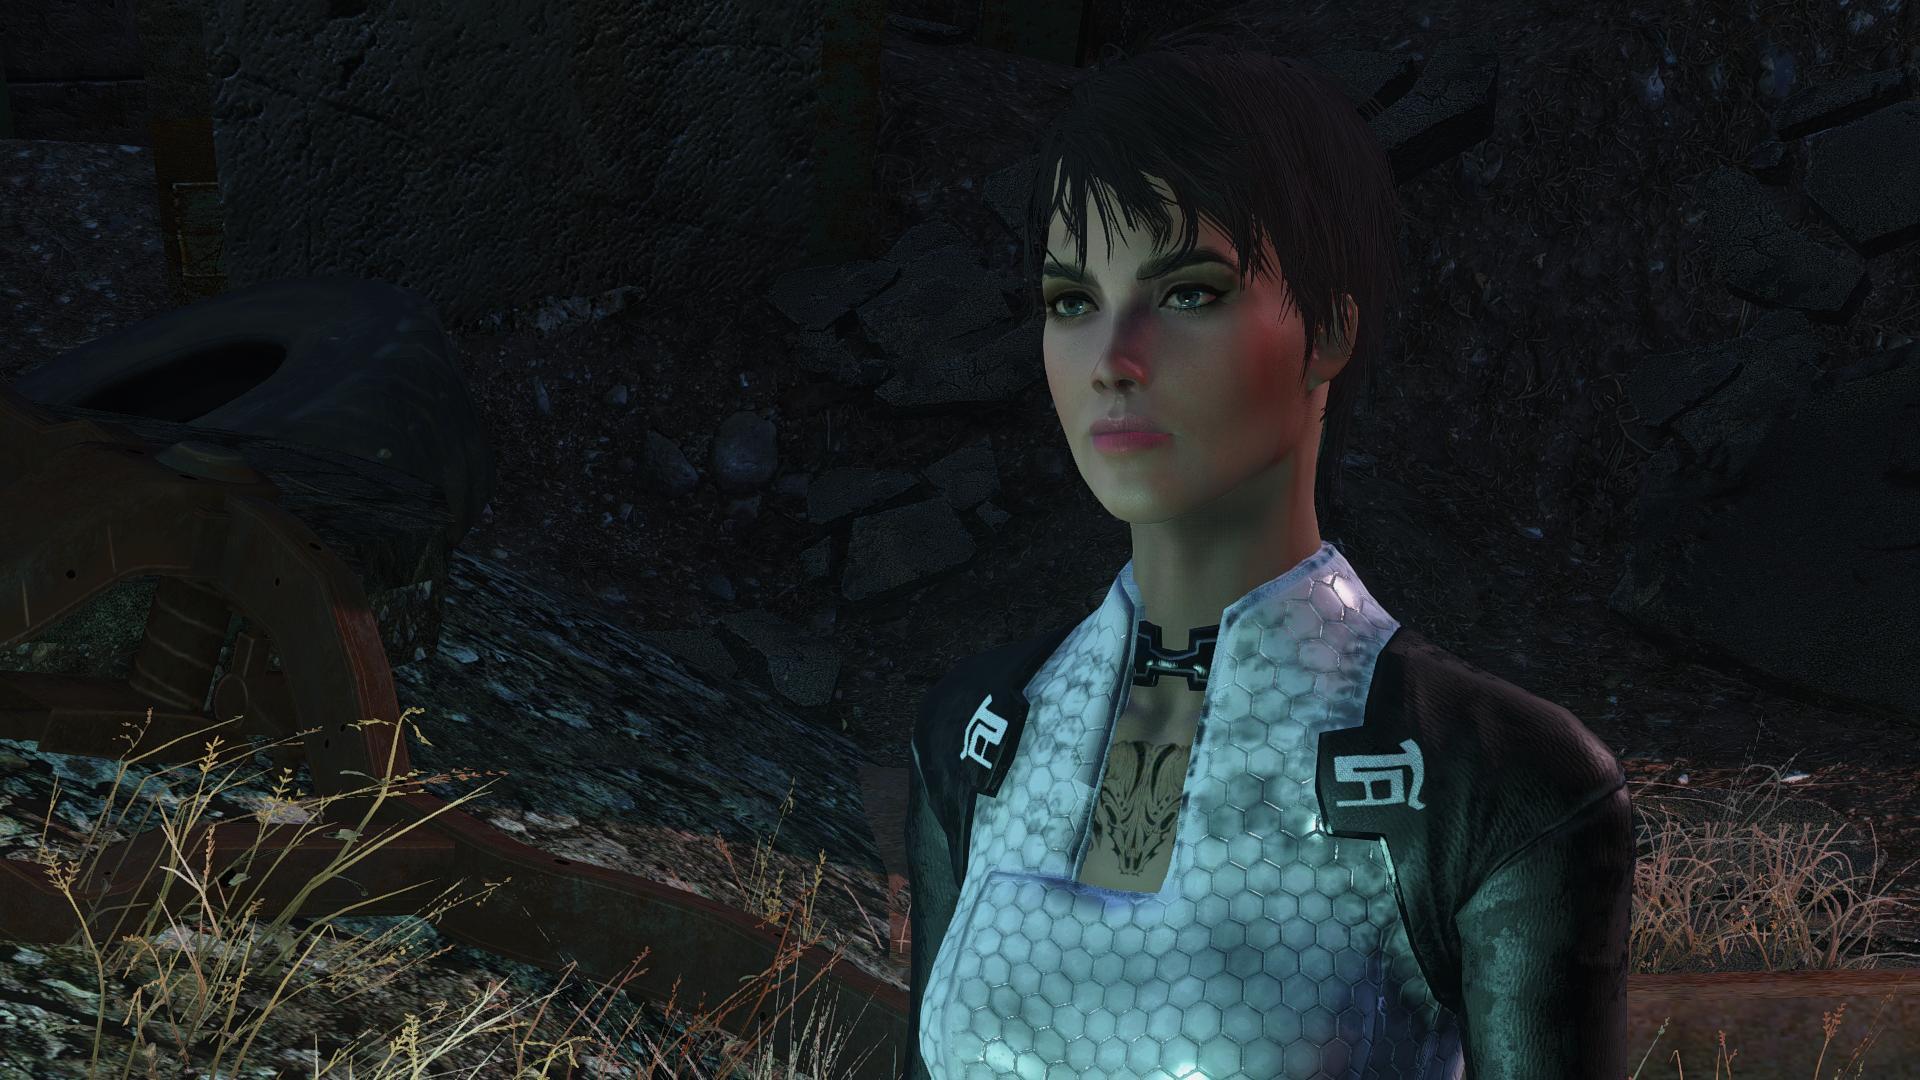 000553.Jpg - Fallout 4